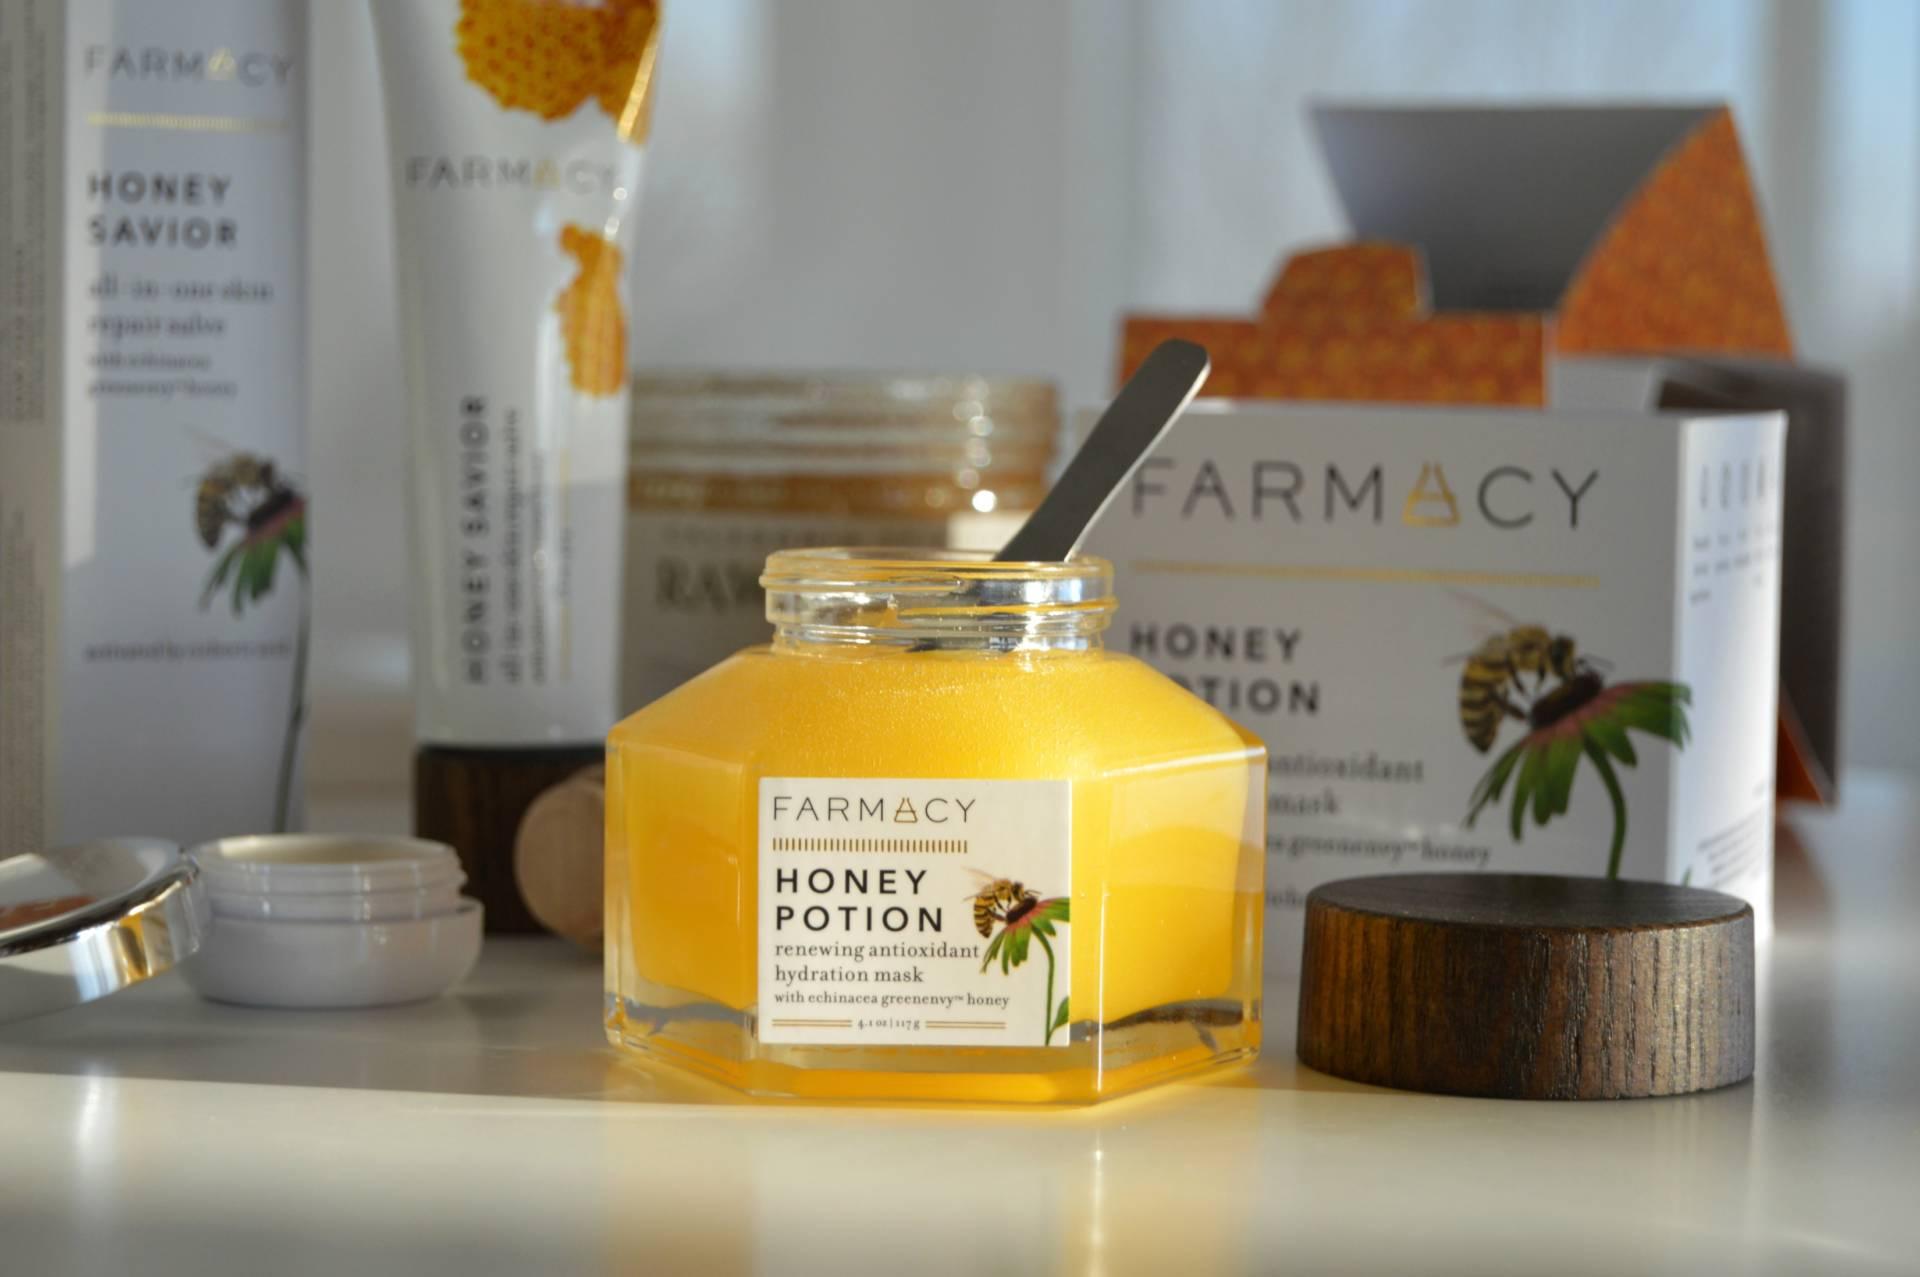 farmacy-hone-potion-antioxidant-mask-review-inhautepursuit-sephora-beauty